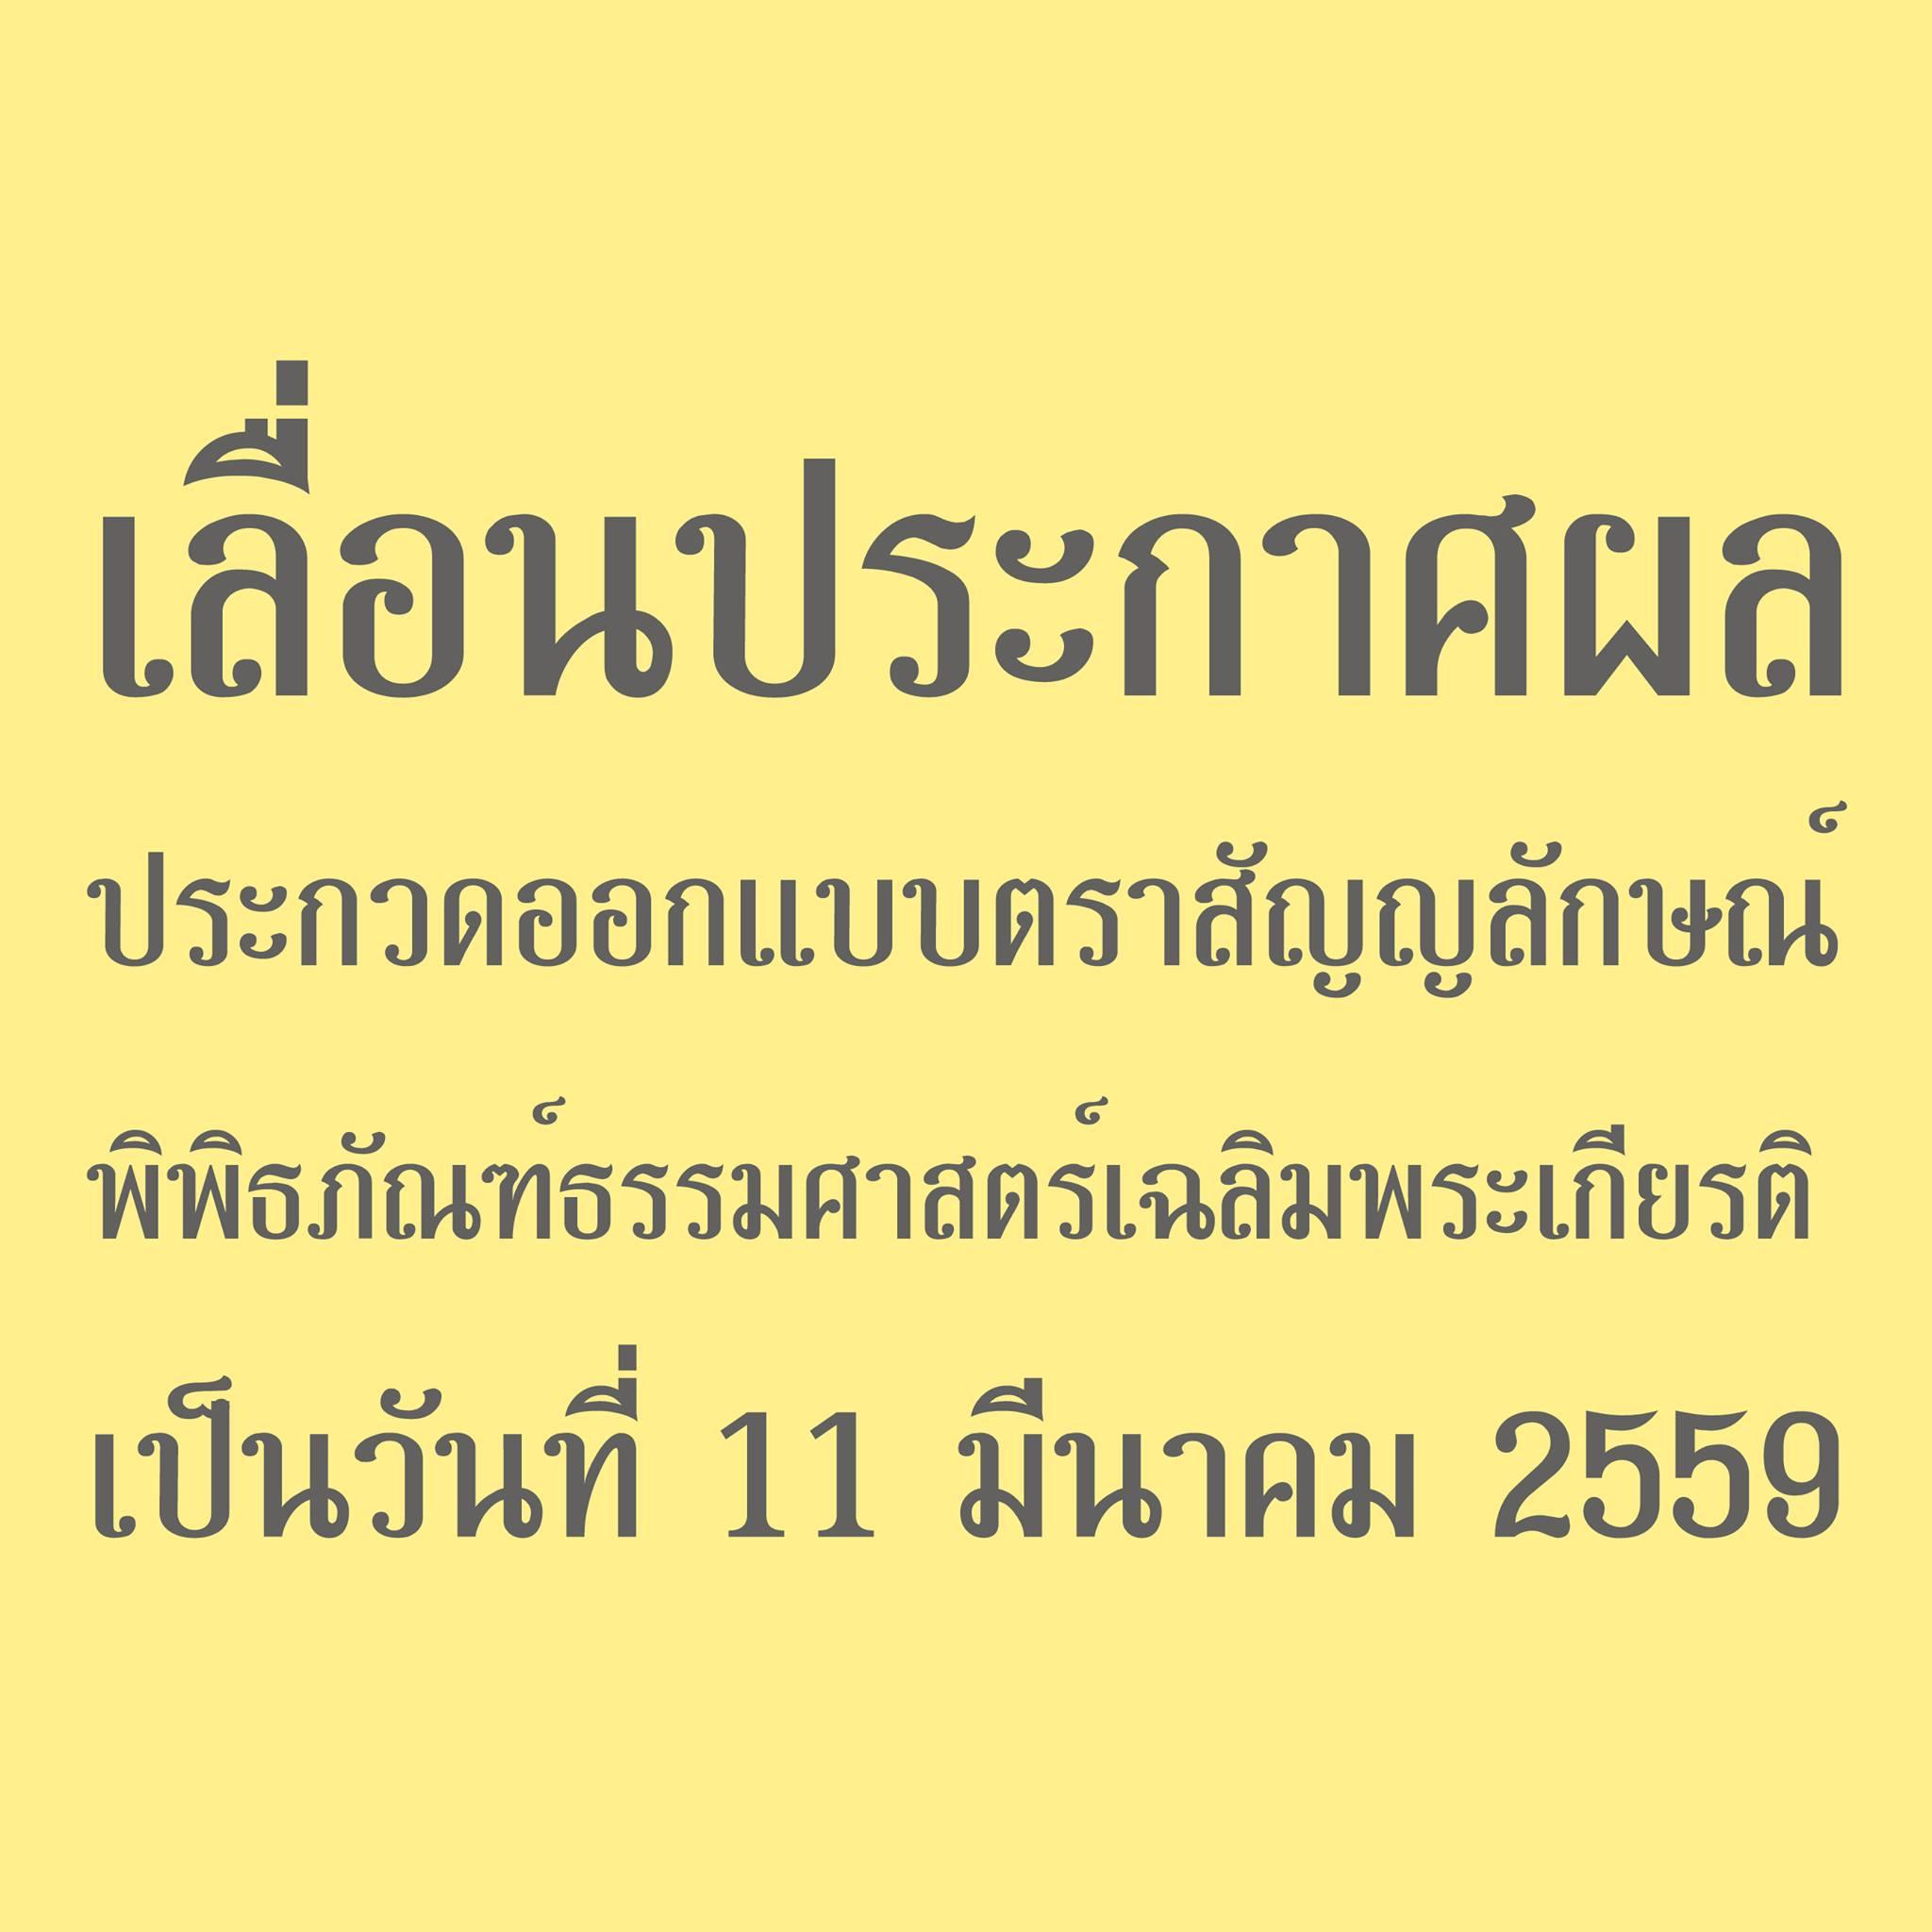 12656181_974554659247466_981546180_o